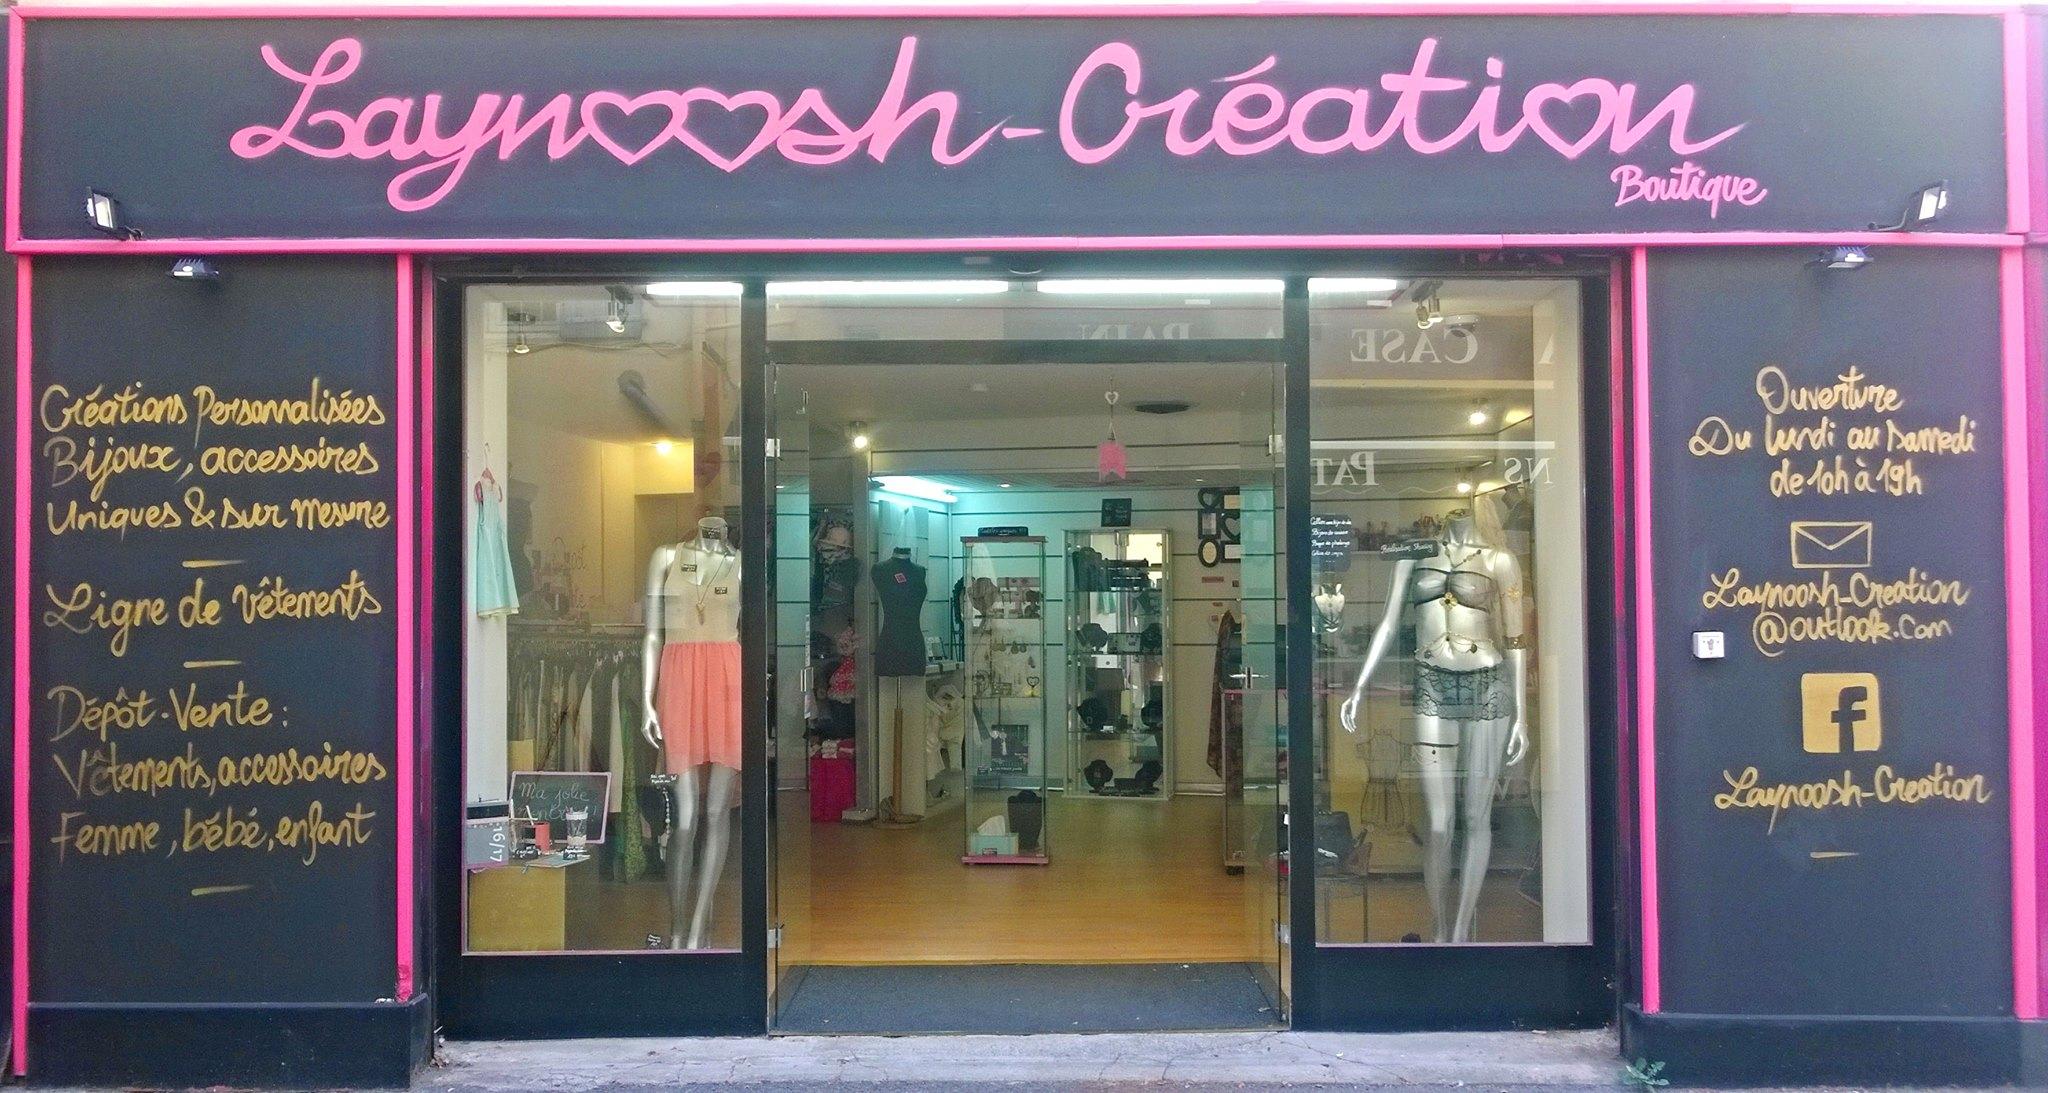 Laynoosh-Création